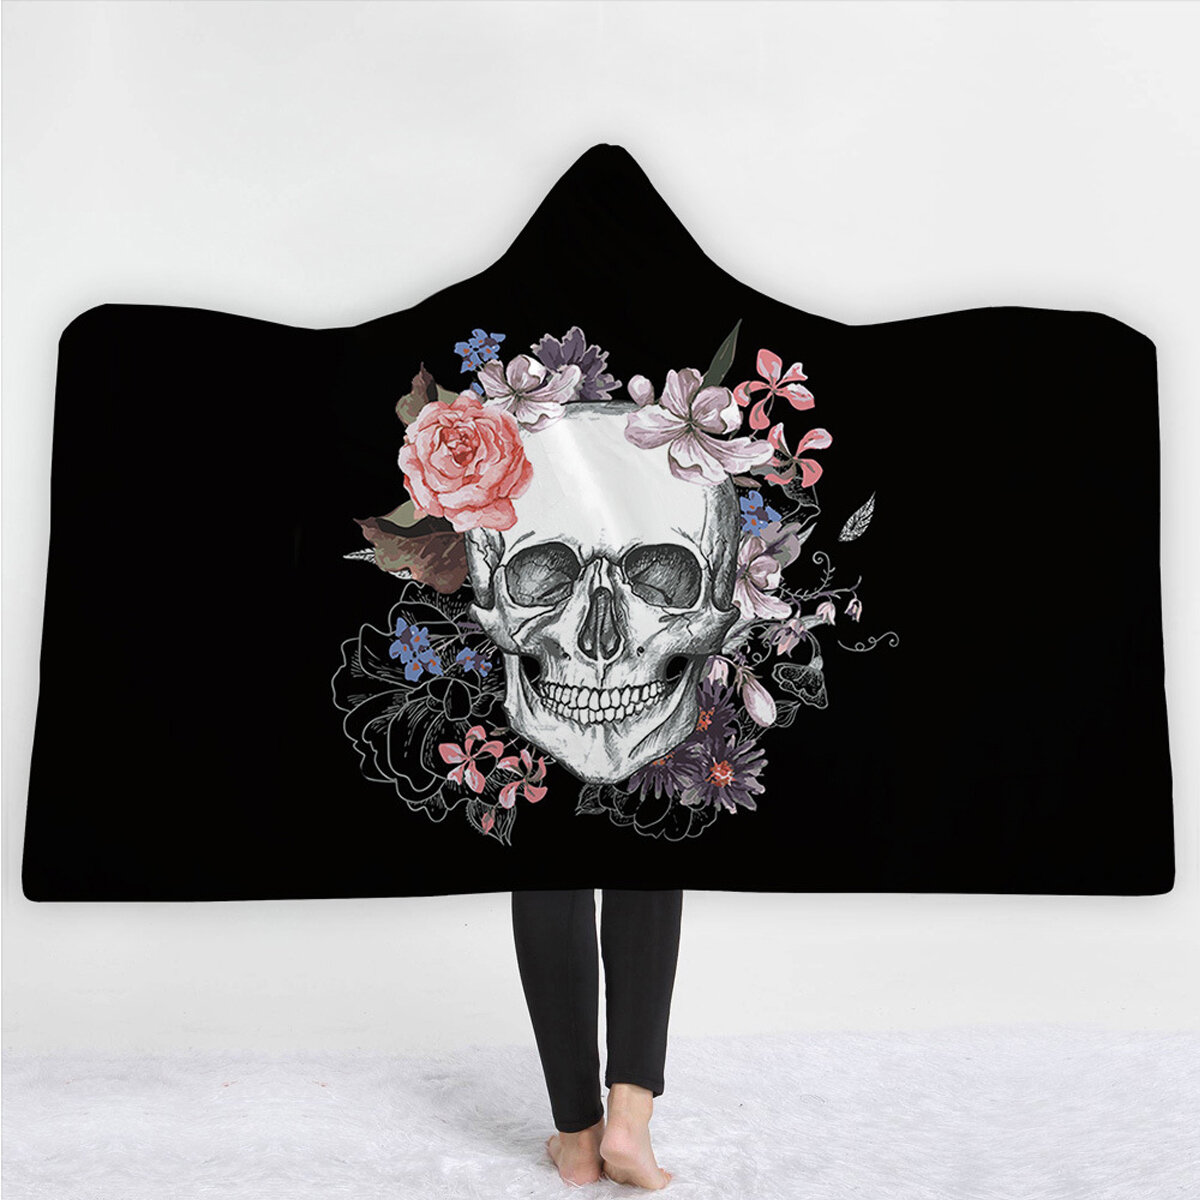 Sugar Skull Flower Hooded Blanket for Adults Floral Gothic Sherpa Fleece Wearable Throw Blanket Microfiber Black